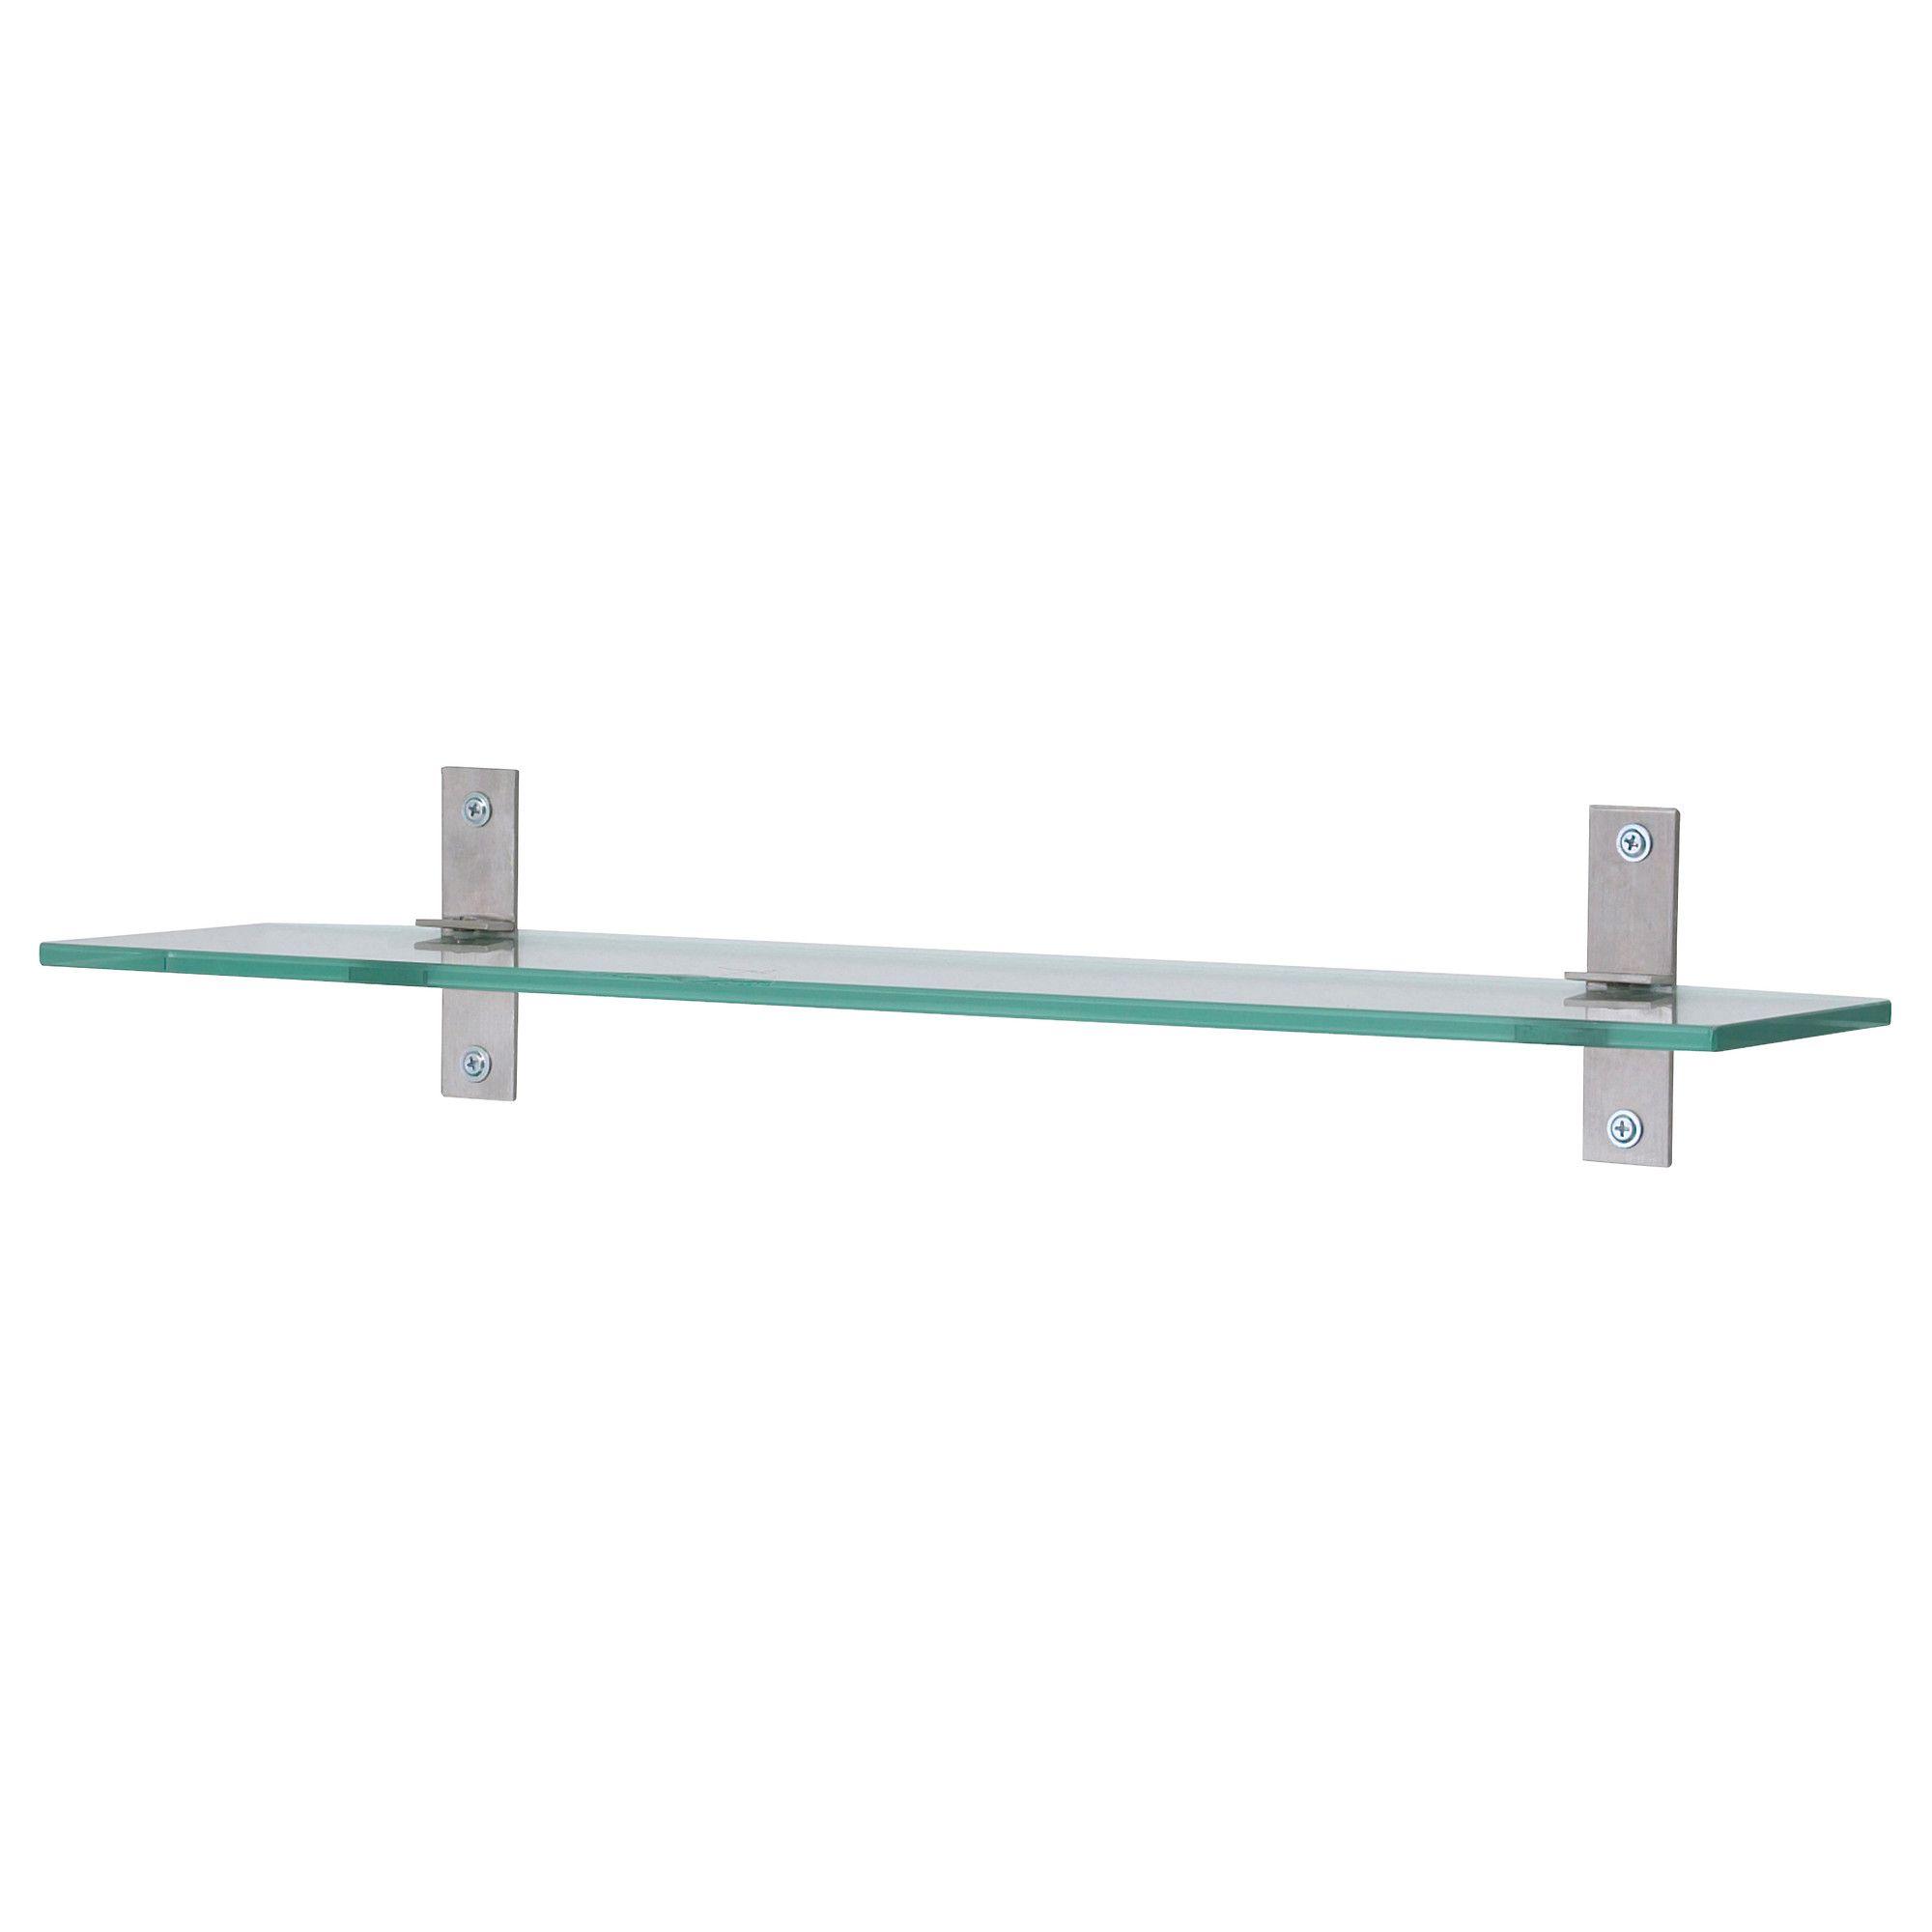 Quelques Liens Utiles: Etagere Inox Ikea Grundtal